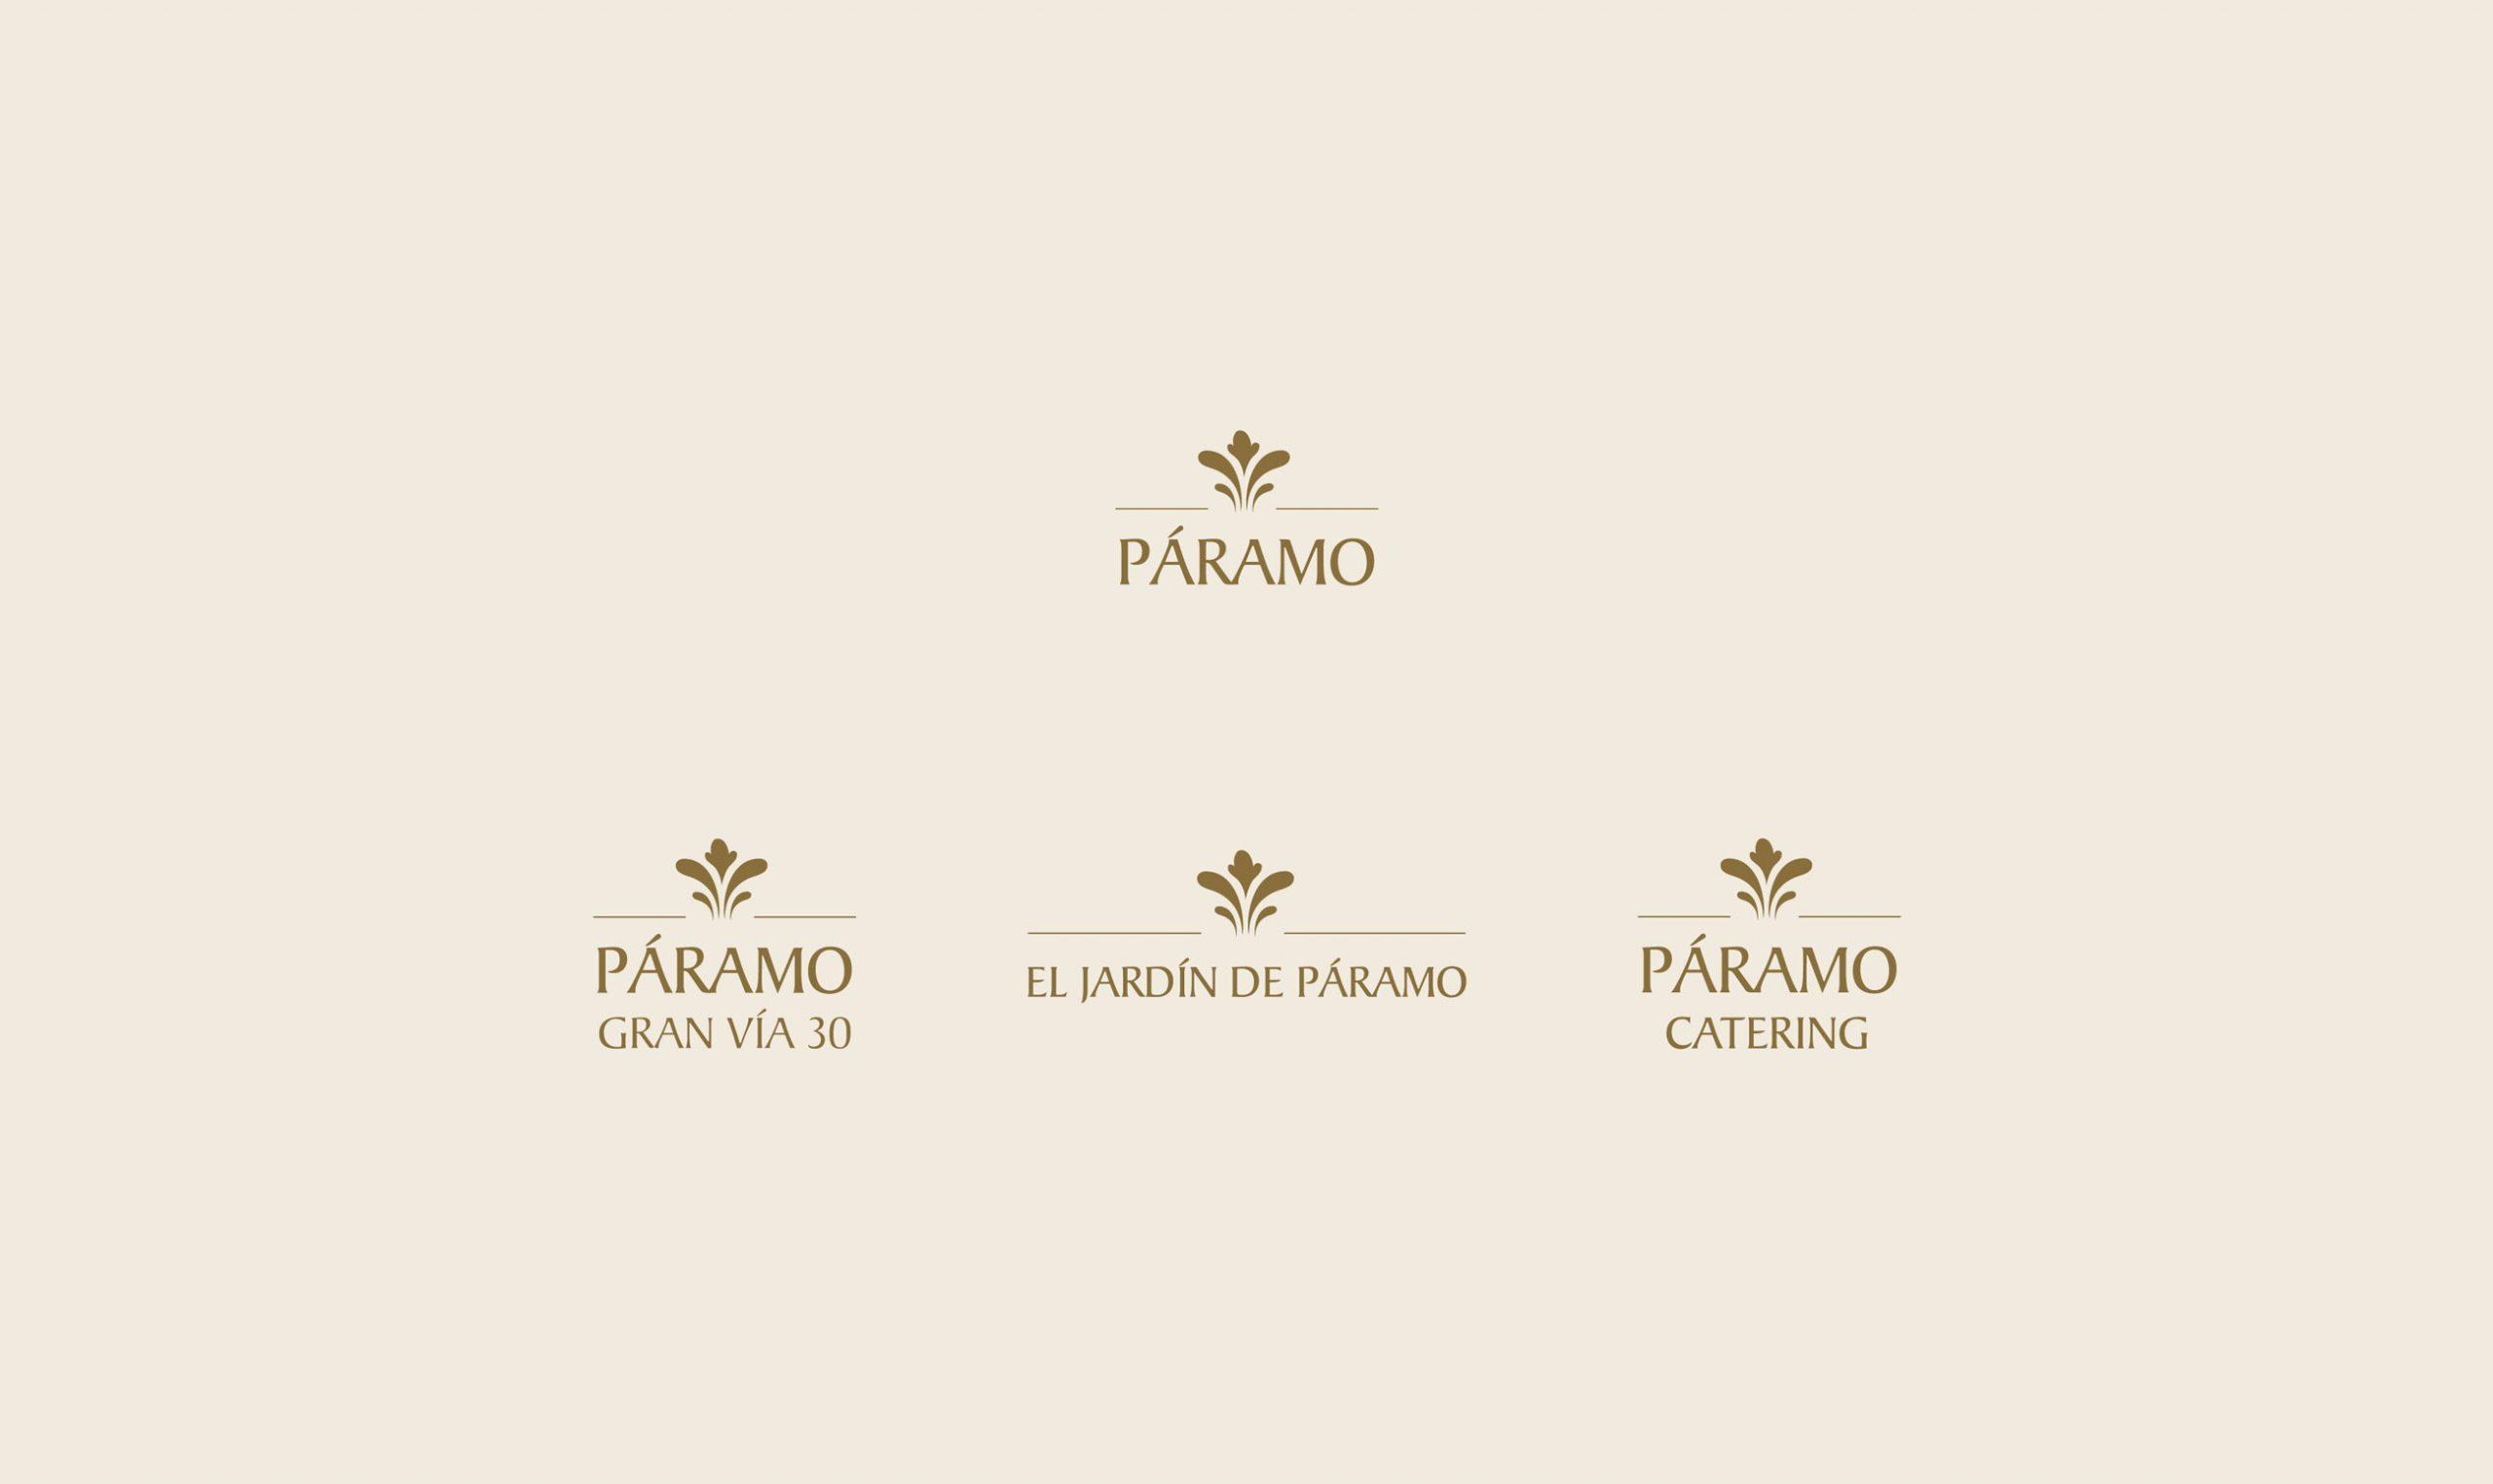 giset design paramo logos restyling